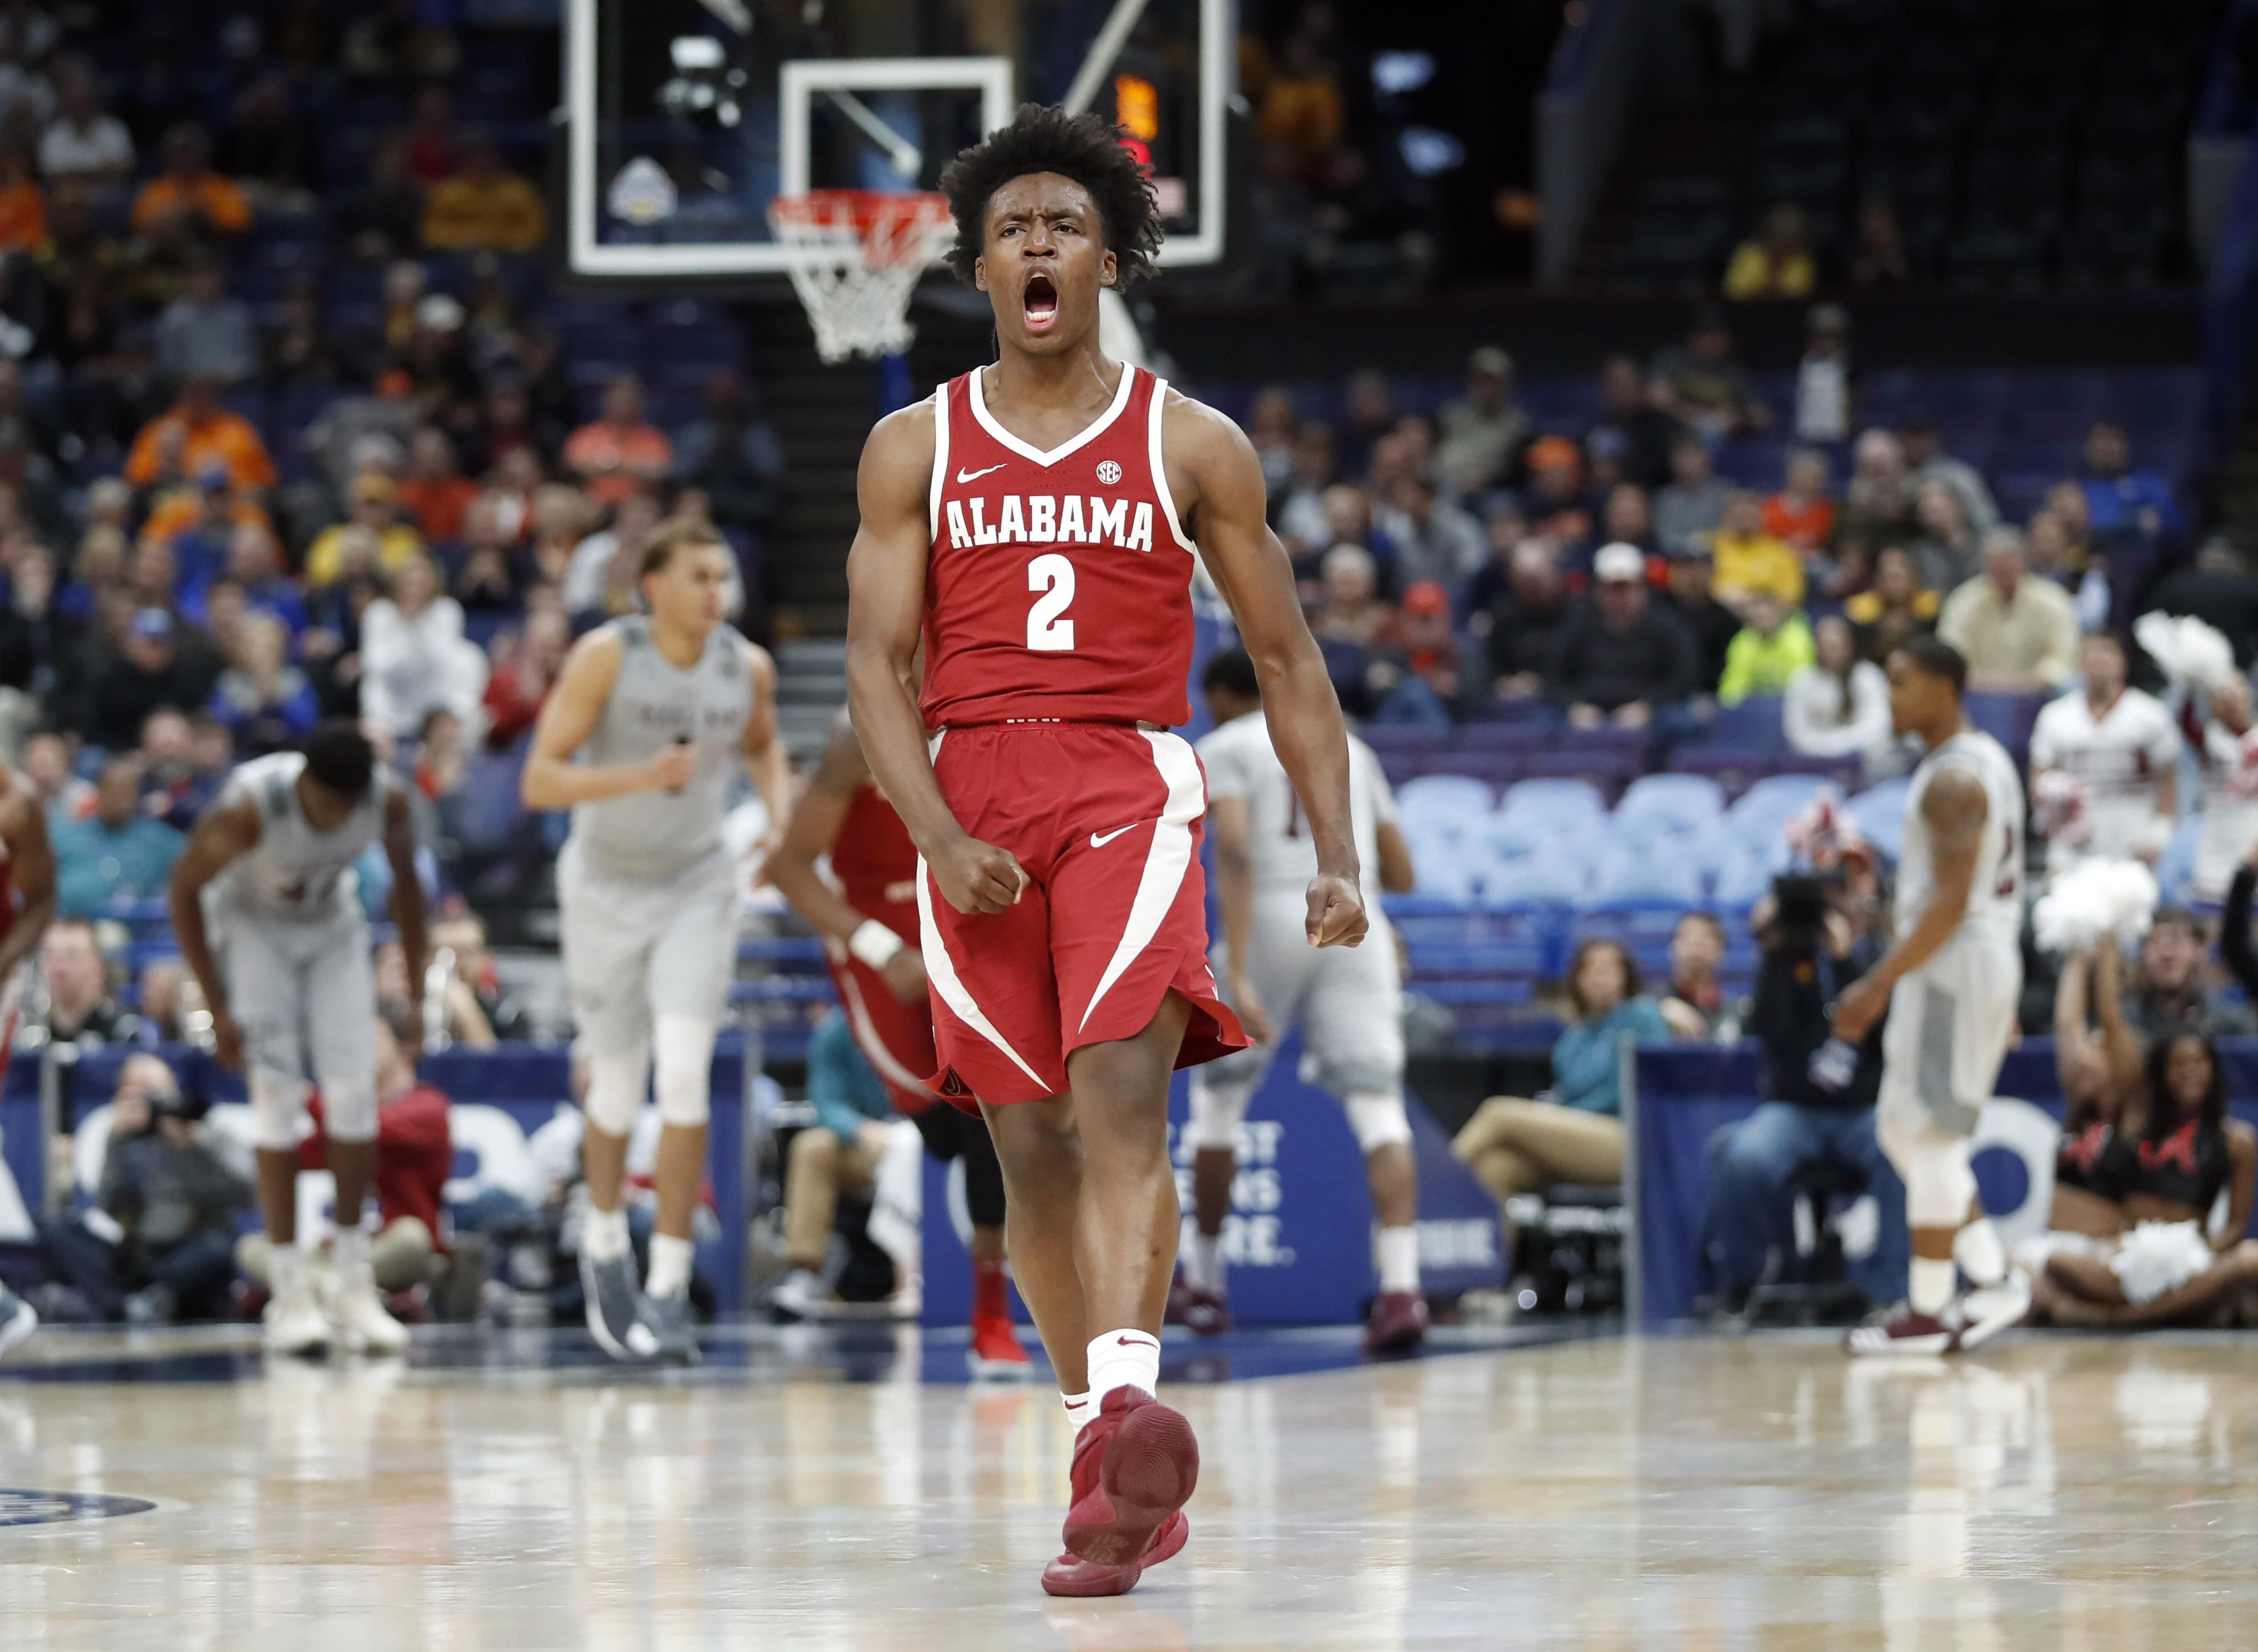 Collin Sexton's coast-to-coast drive preserves Alabama's hopes of an NCAA bid